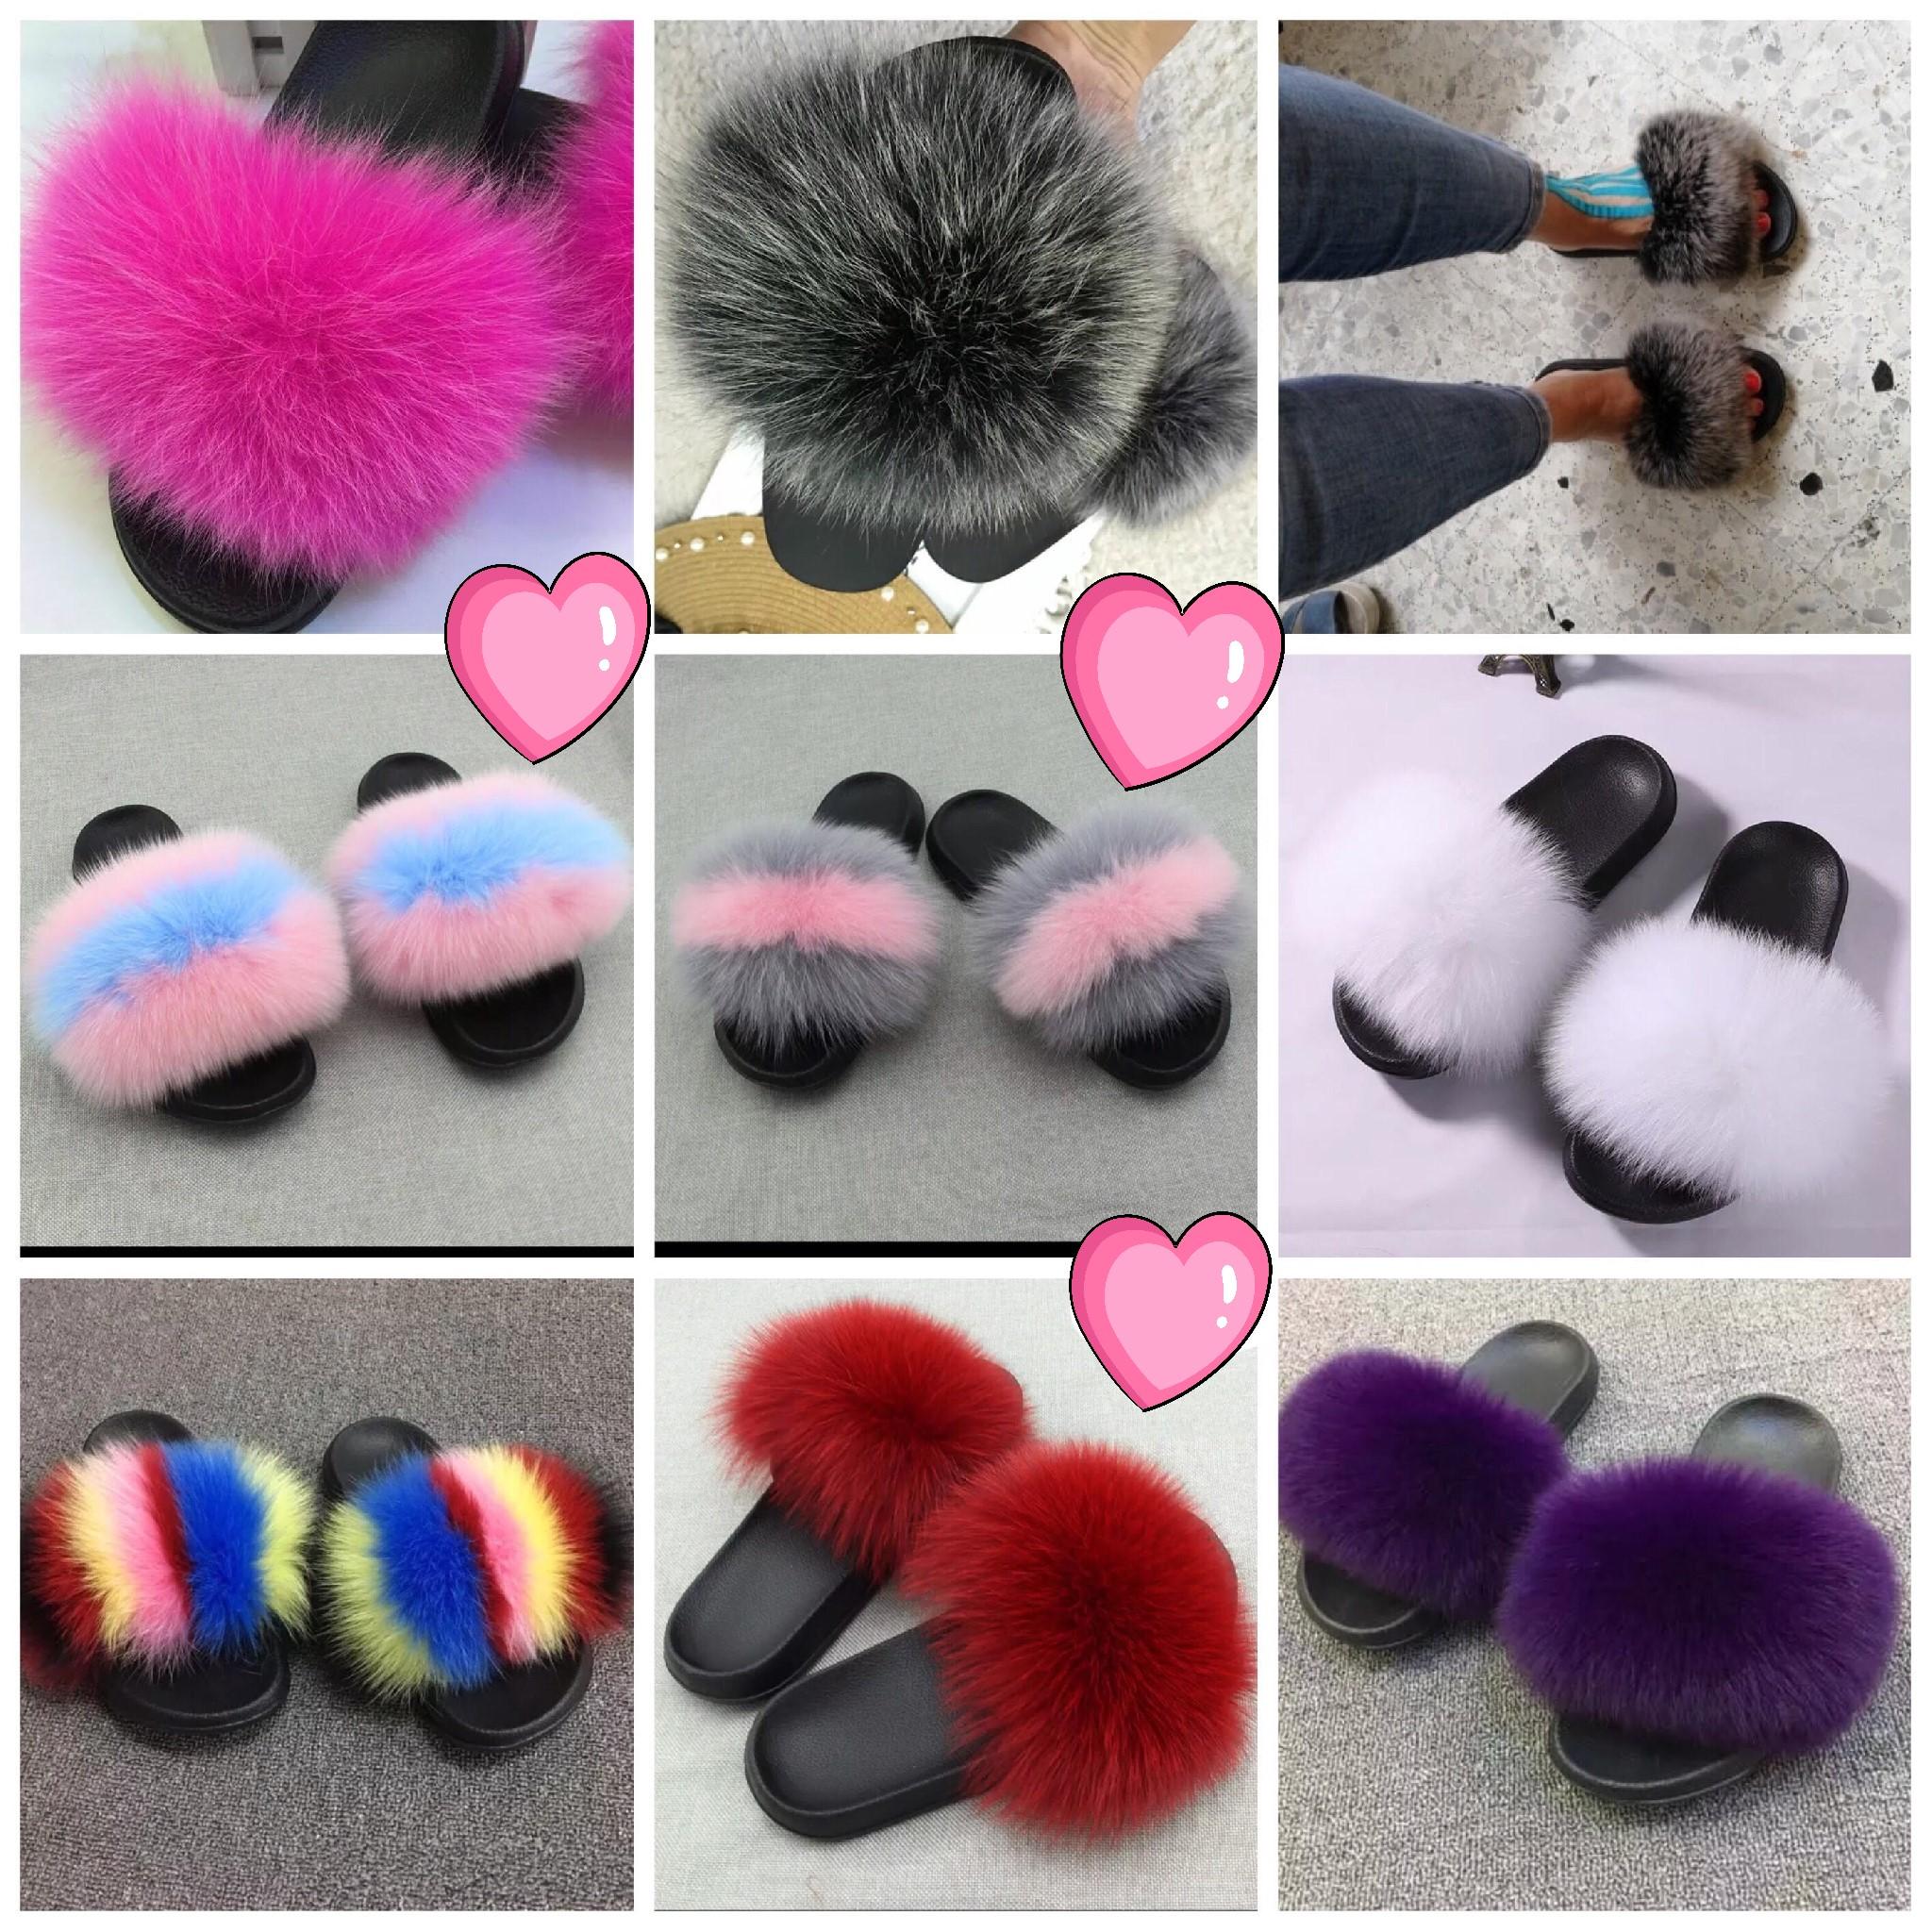 101254763ec Luxury Plush Furry Fur Slides Women s Size 6-13 on Storenvy